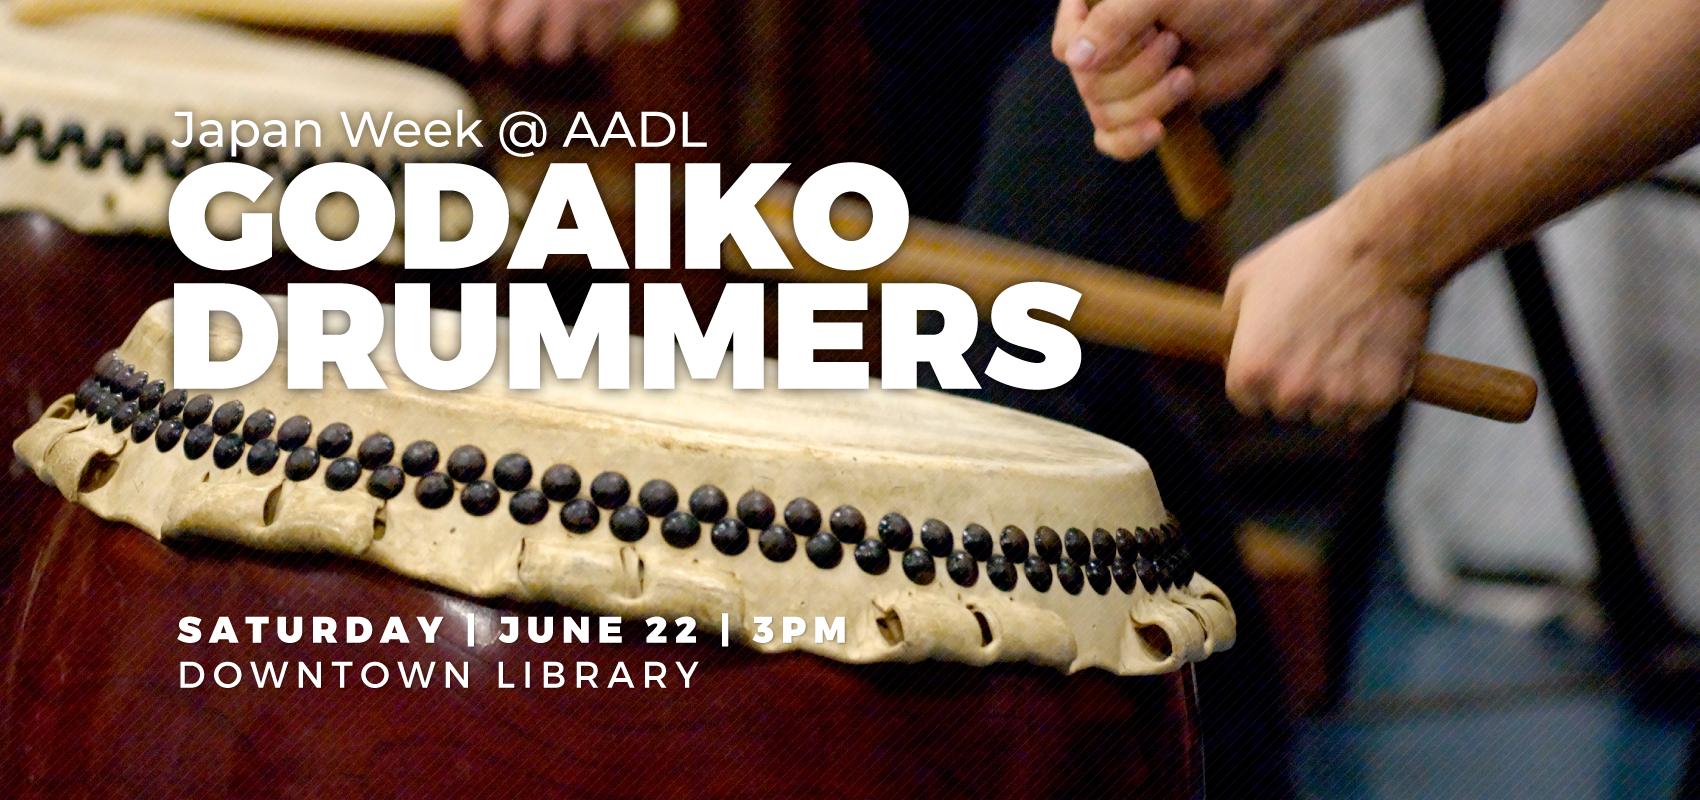 Godaiko Drummers - Saturday June 22. .